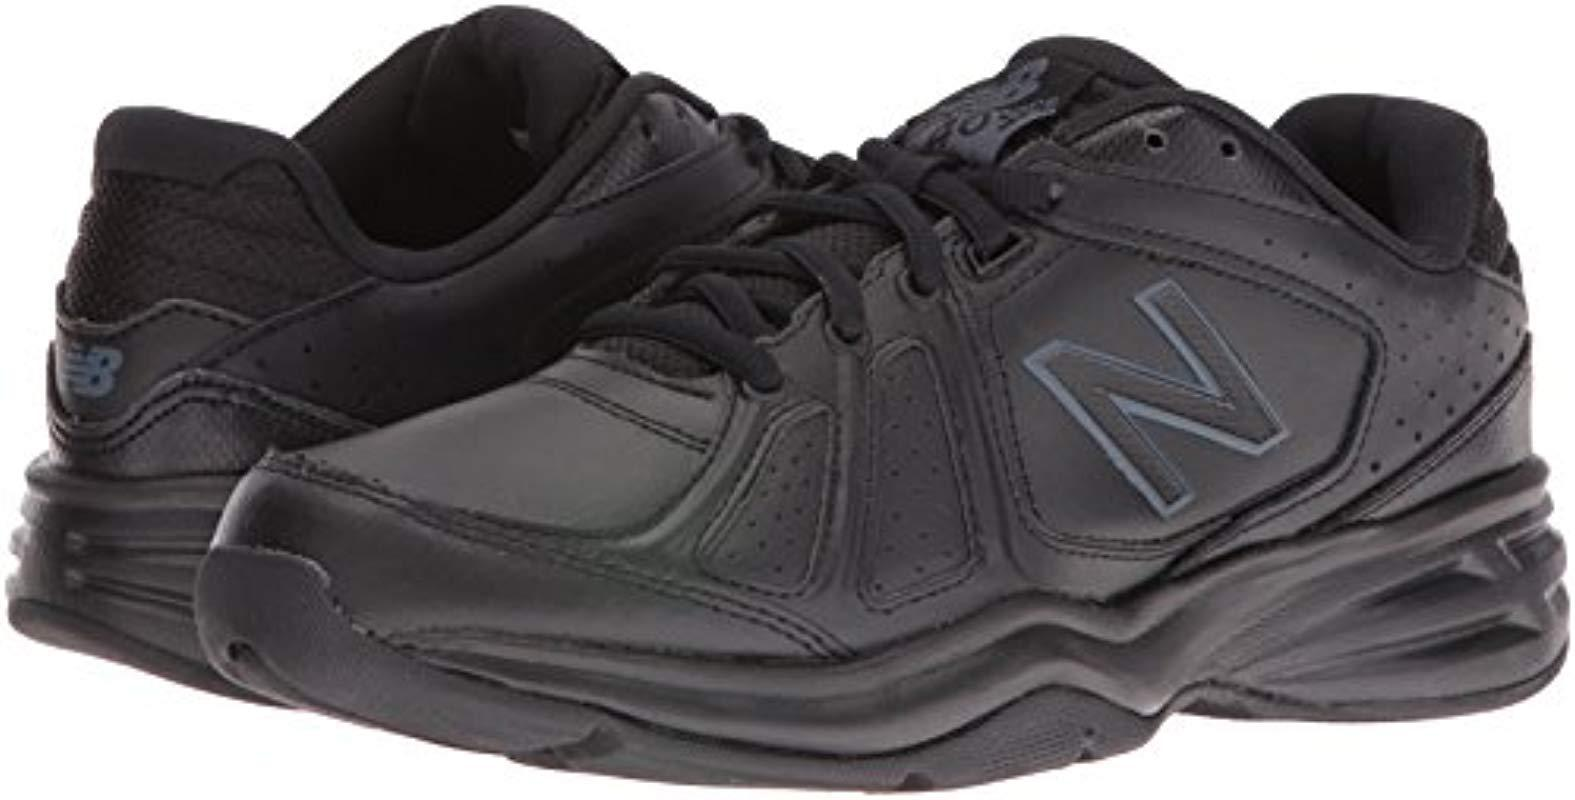 Mx409v3 Casual Comfort Training Shoe